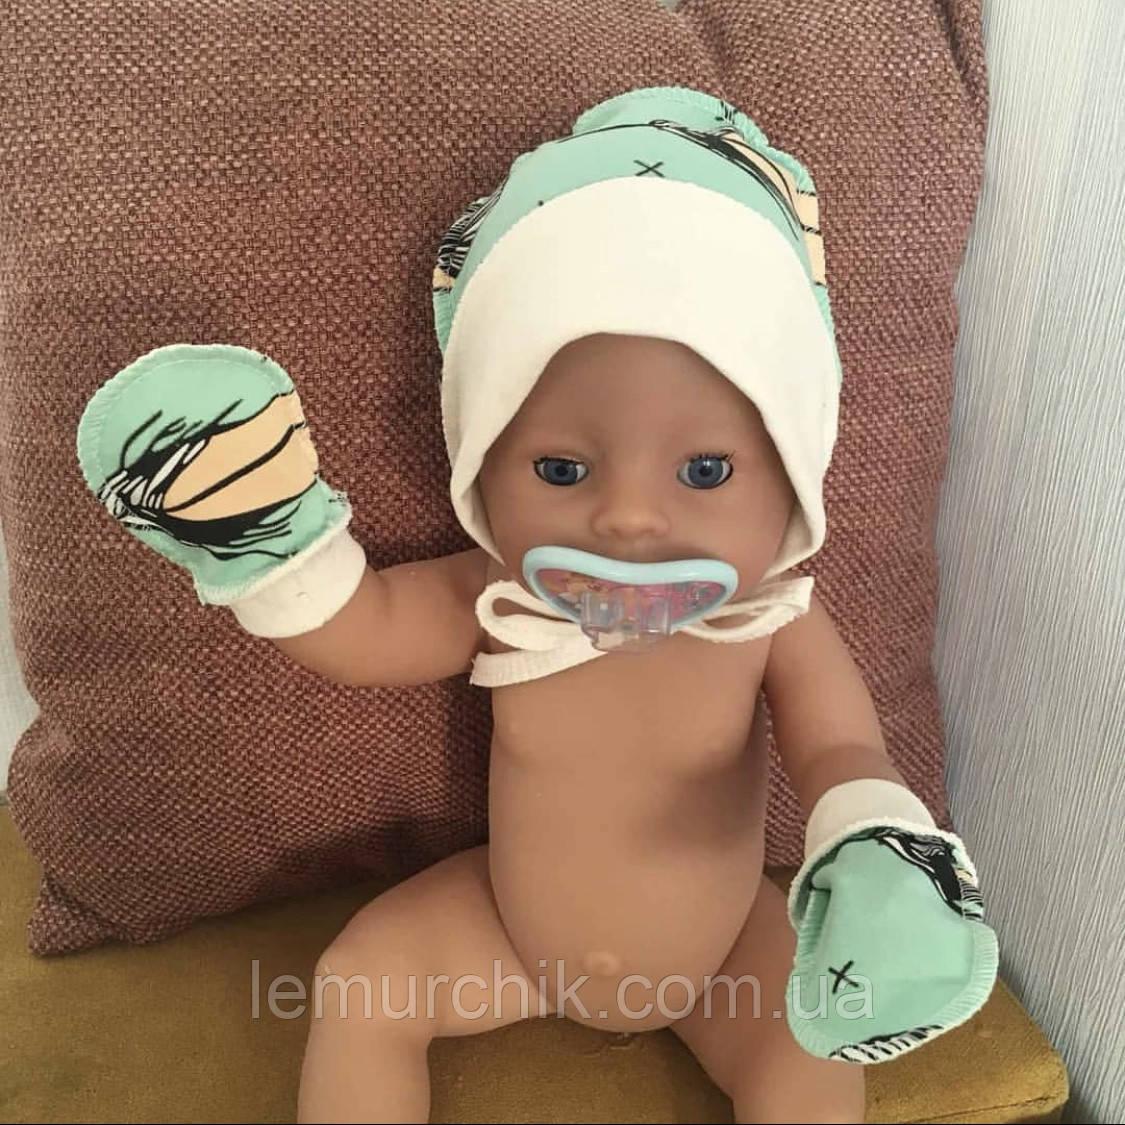 Набор для новорожденного 3 предмета (шапочка, царапки, повязка)